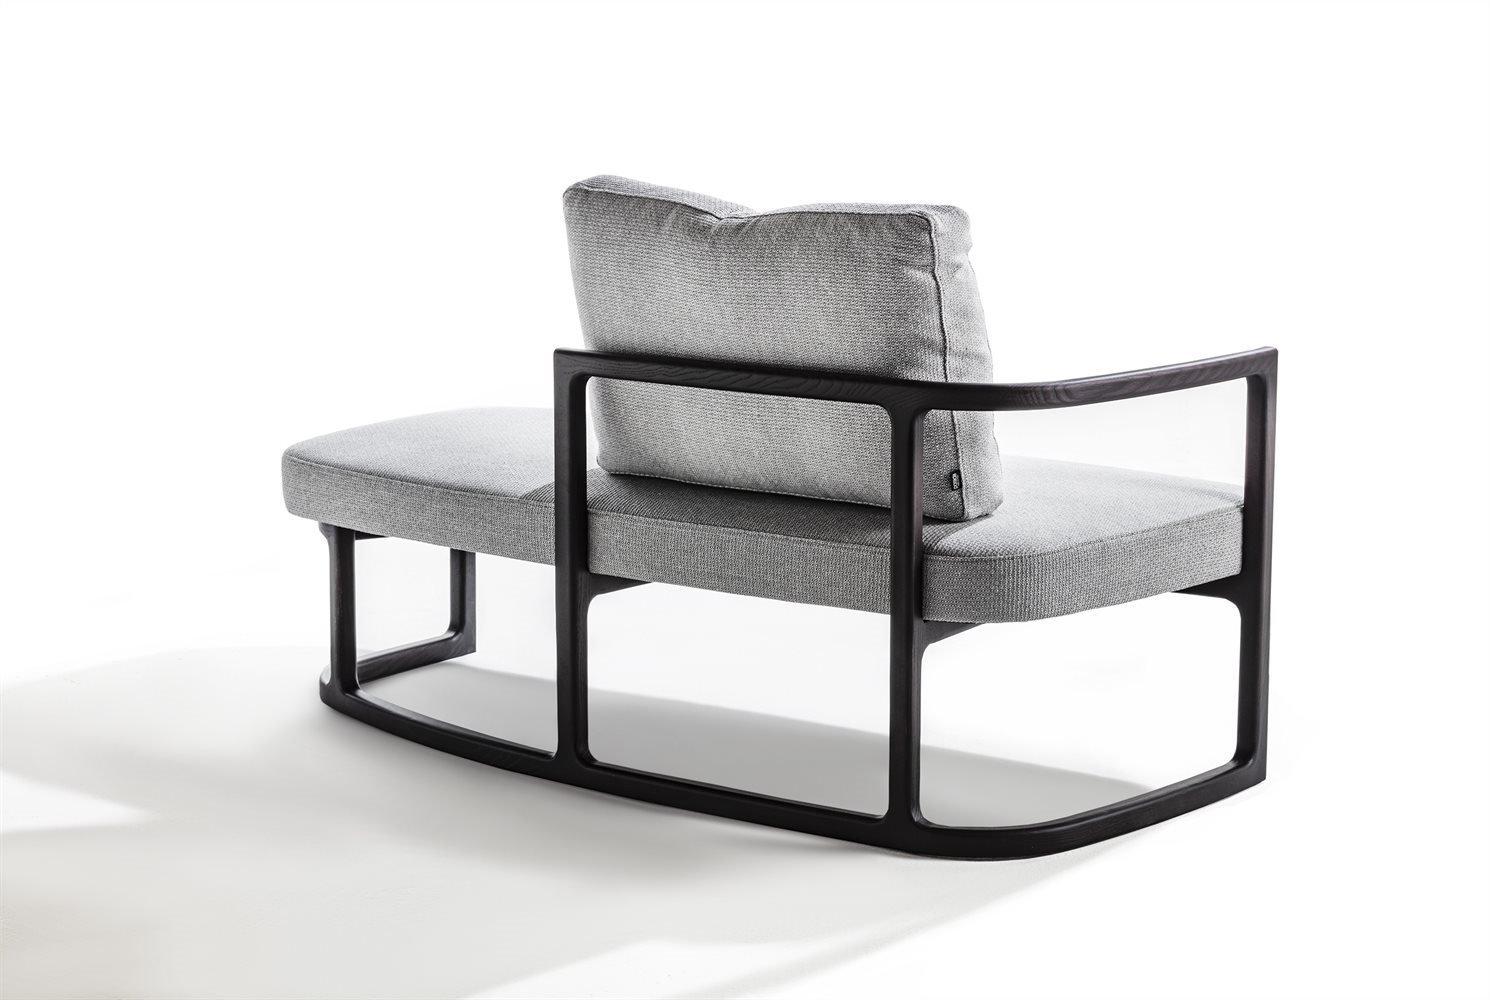 Romain Sofa from Porada, designed by E. Gallina